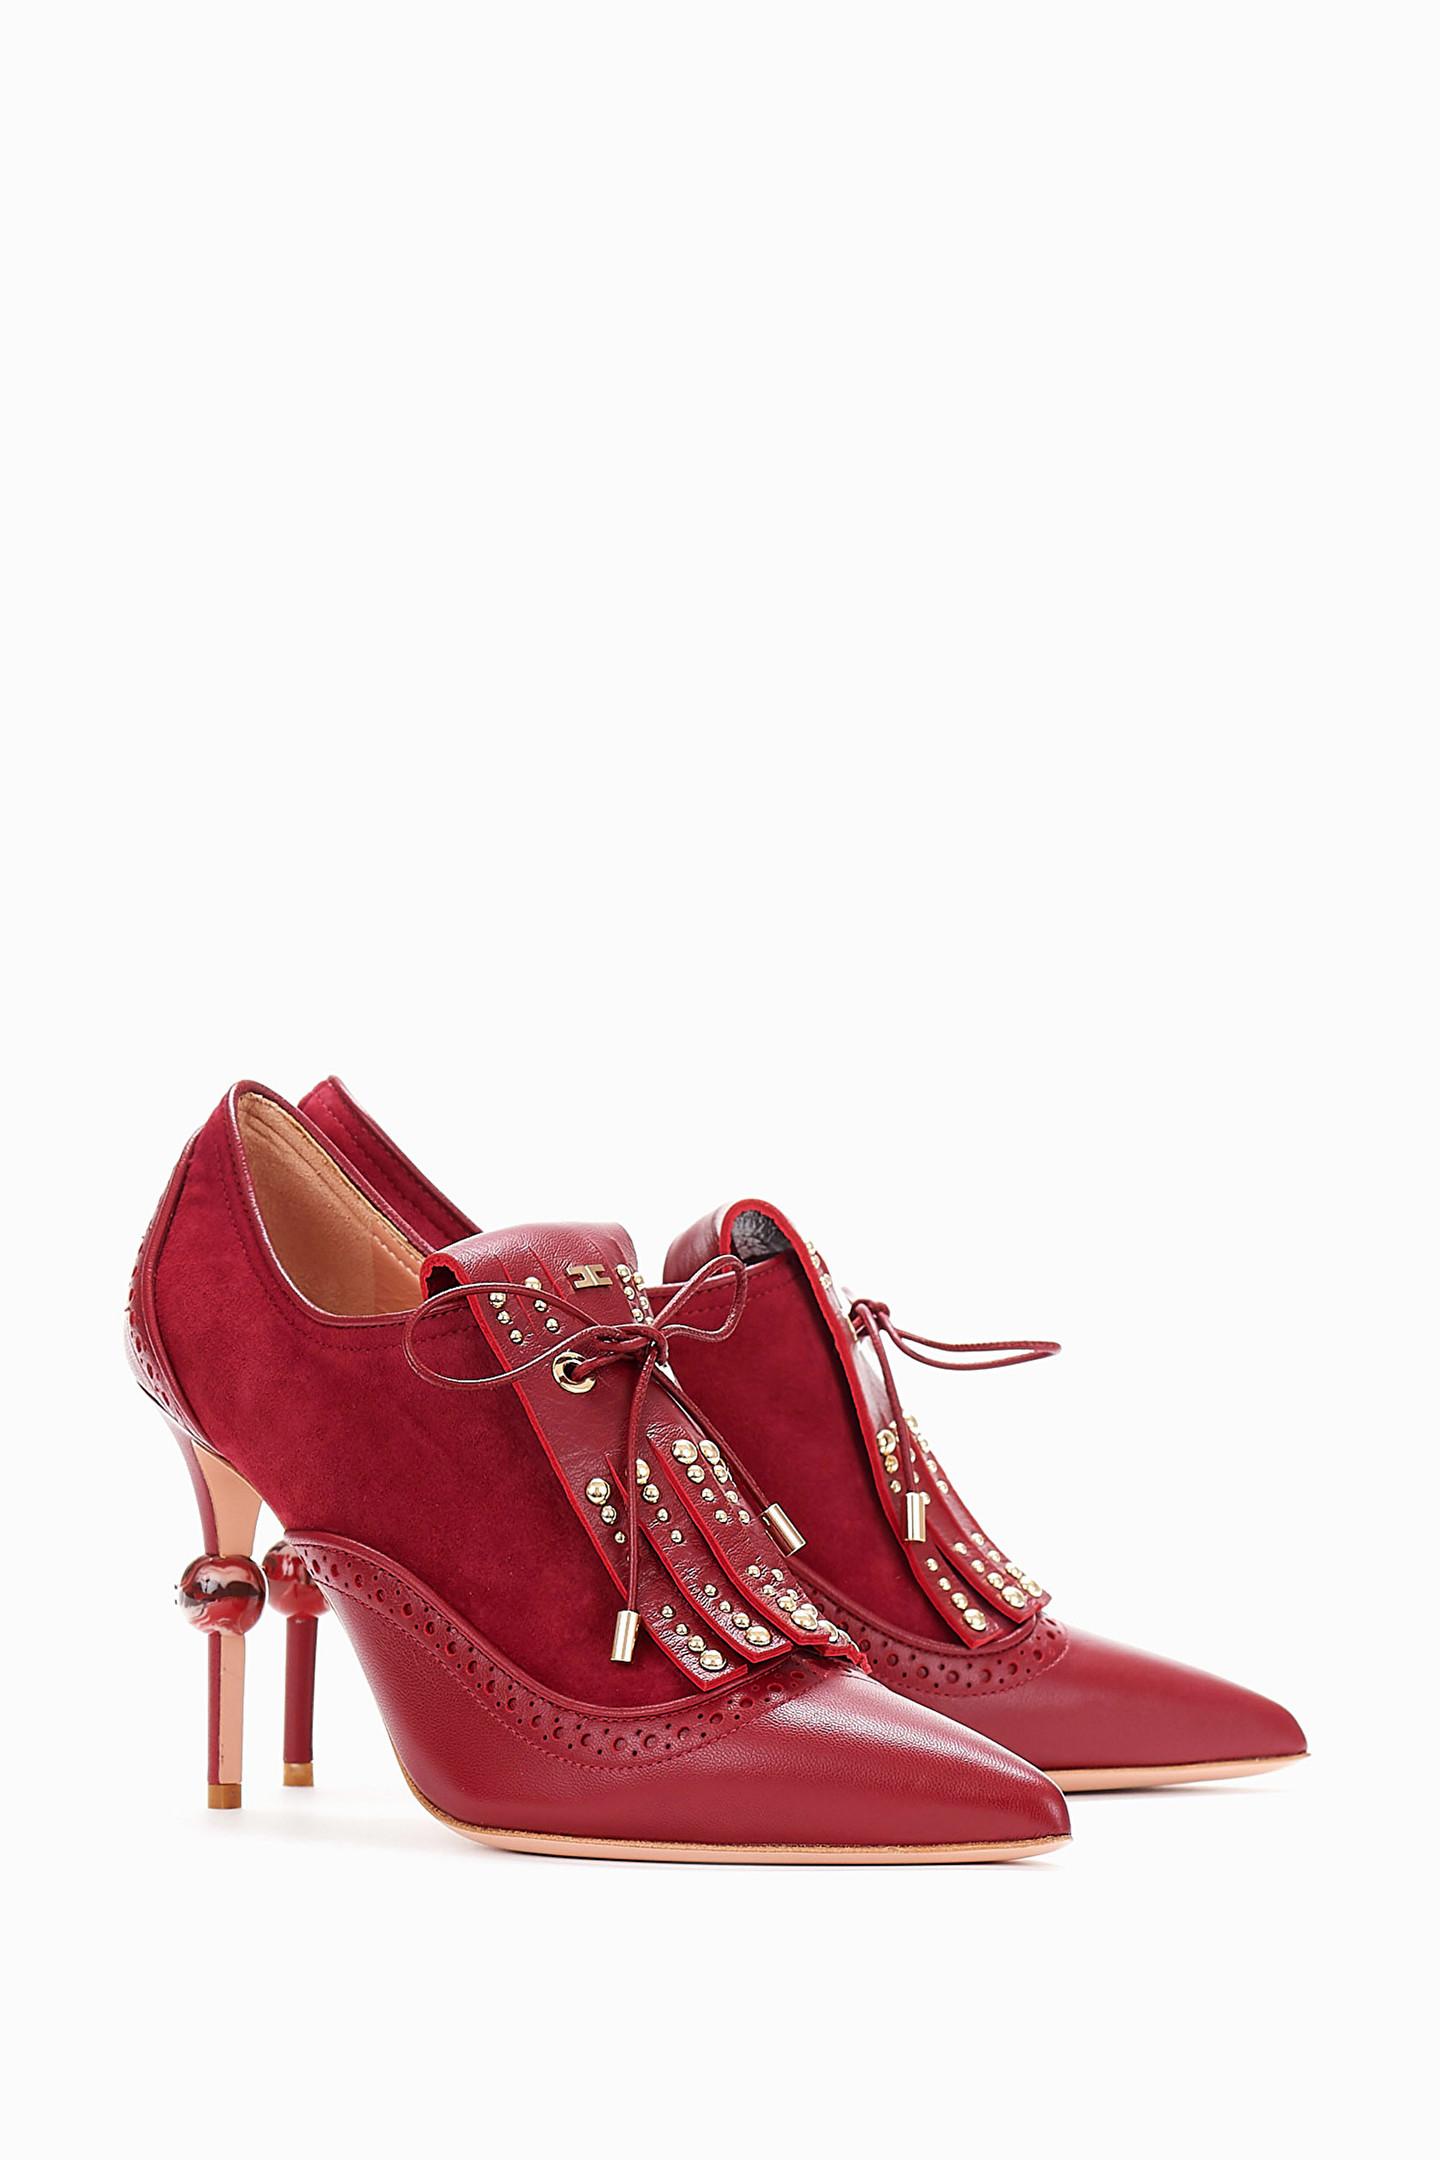 premium selection 60522 428a5 Scarpa con frange e borchie Elisabetta Franchi